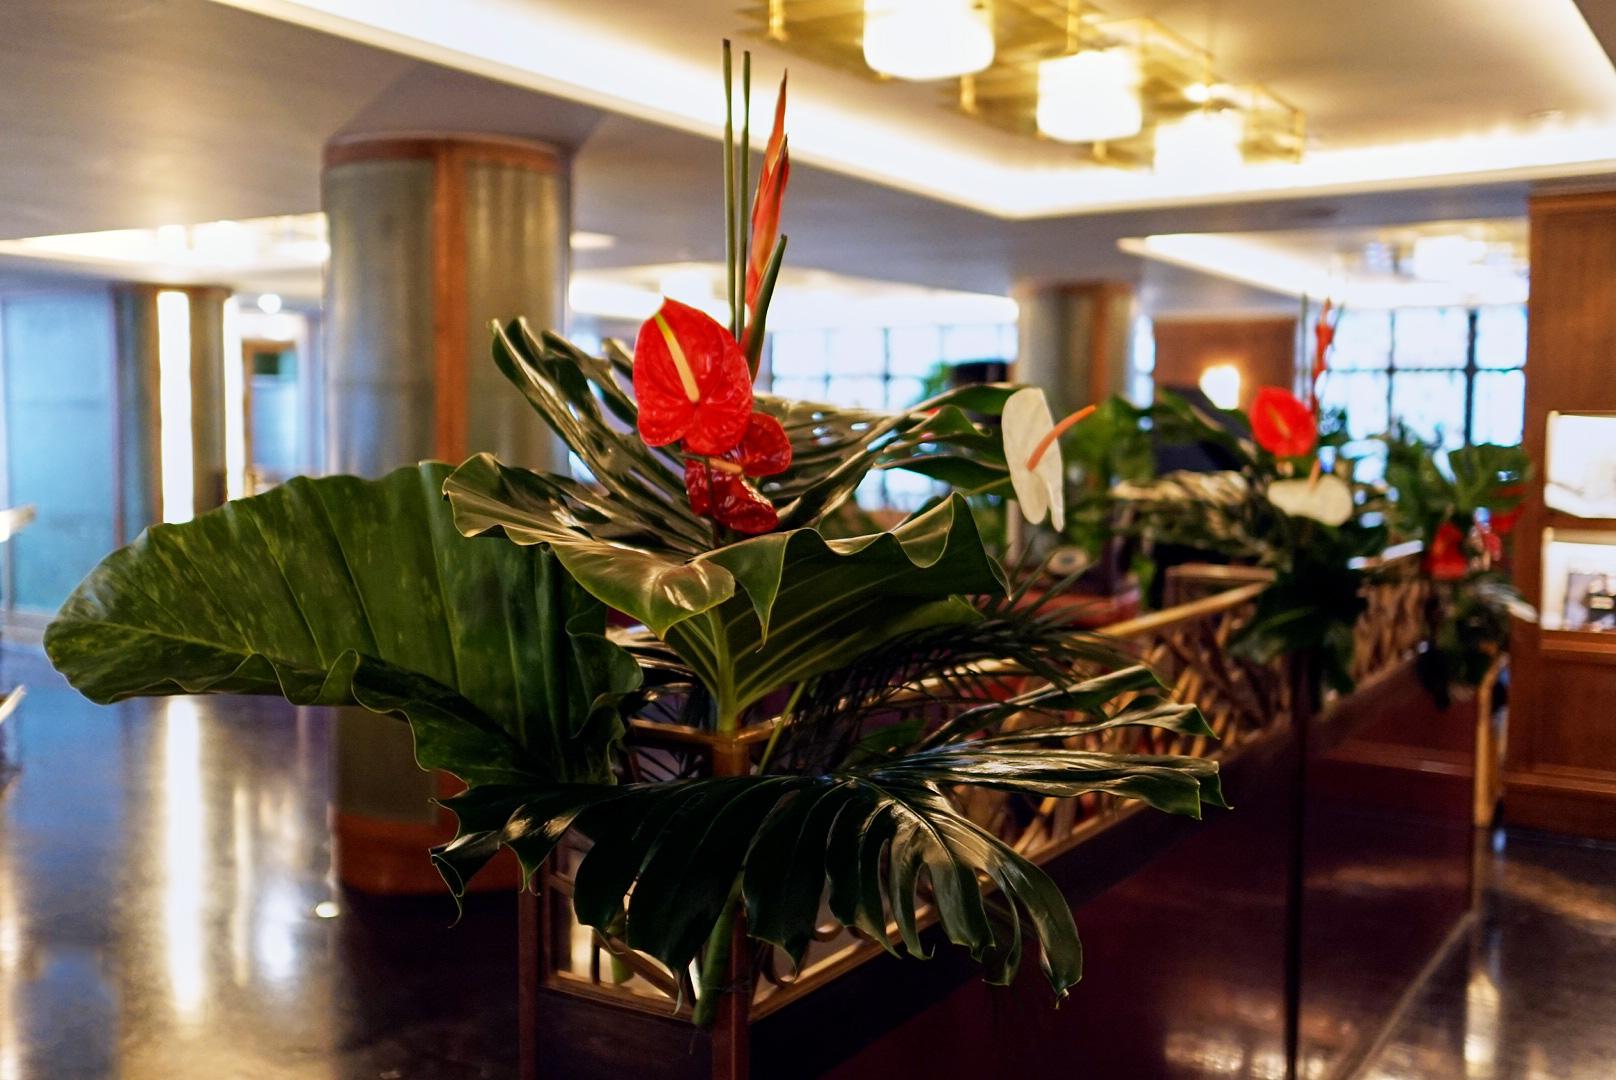 The Ivy Club Flowers - Winter Carnival - Anthurium Flower Arrangement